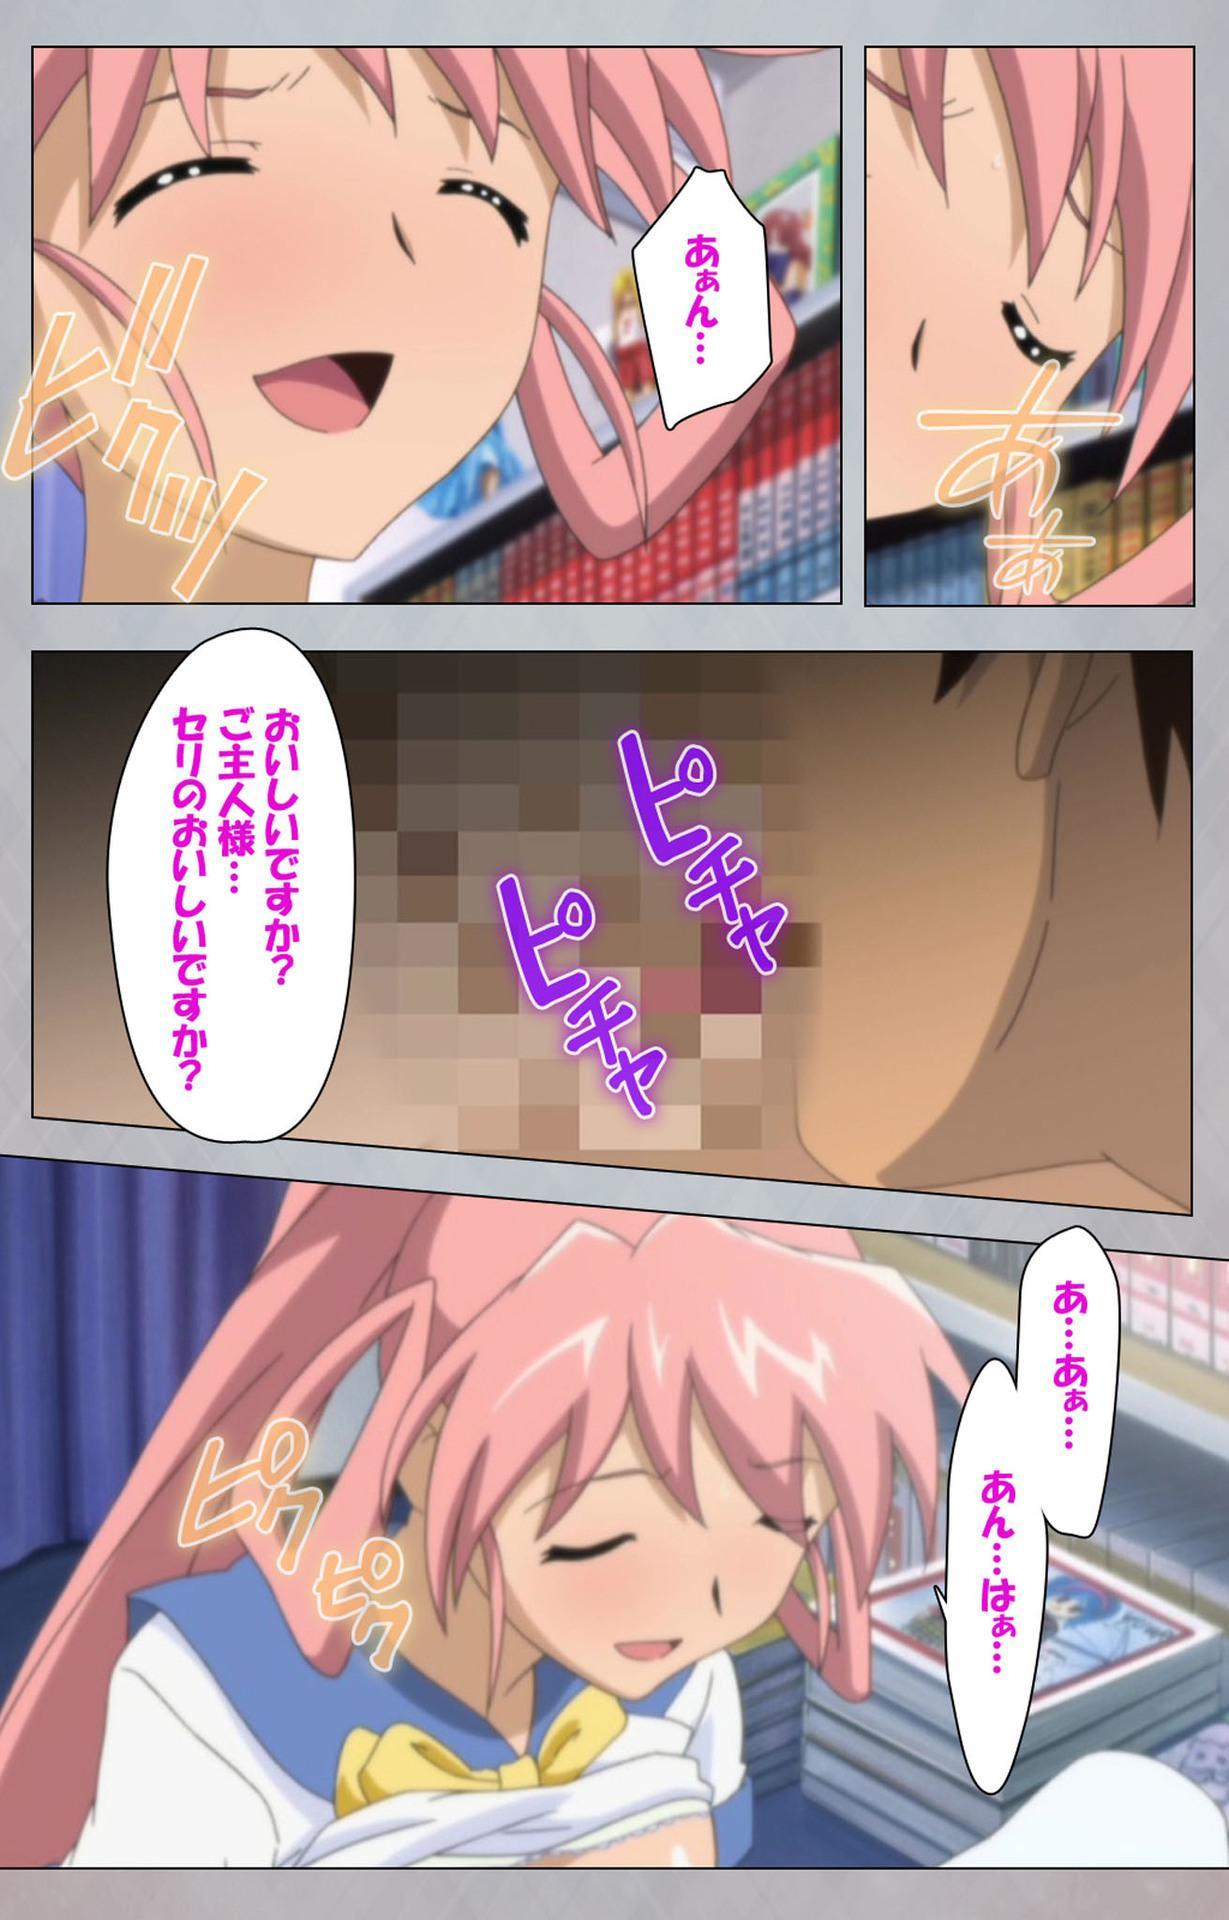 [Digital Works] [Full Color Seijin Ban] Sex Android ~Risou no Onna de Nuite yaru~ Kanzenban 52